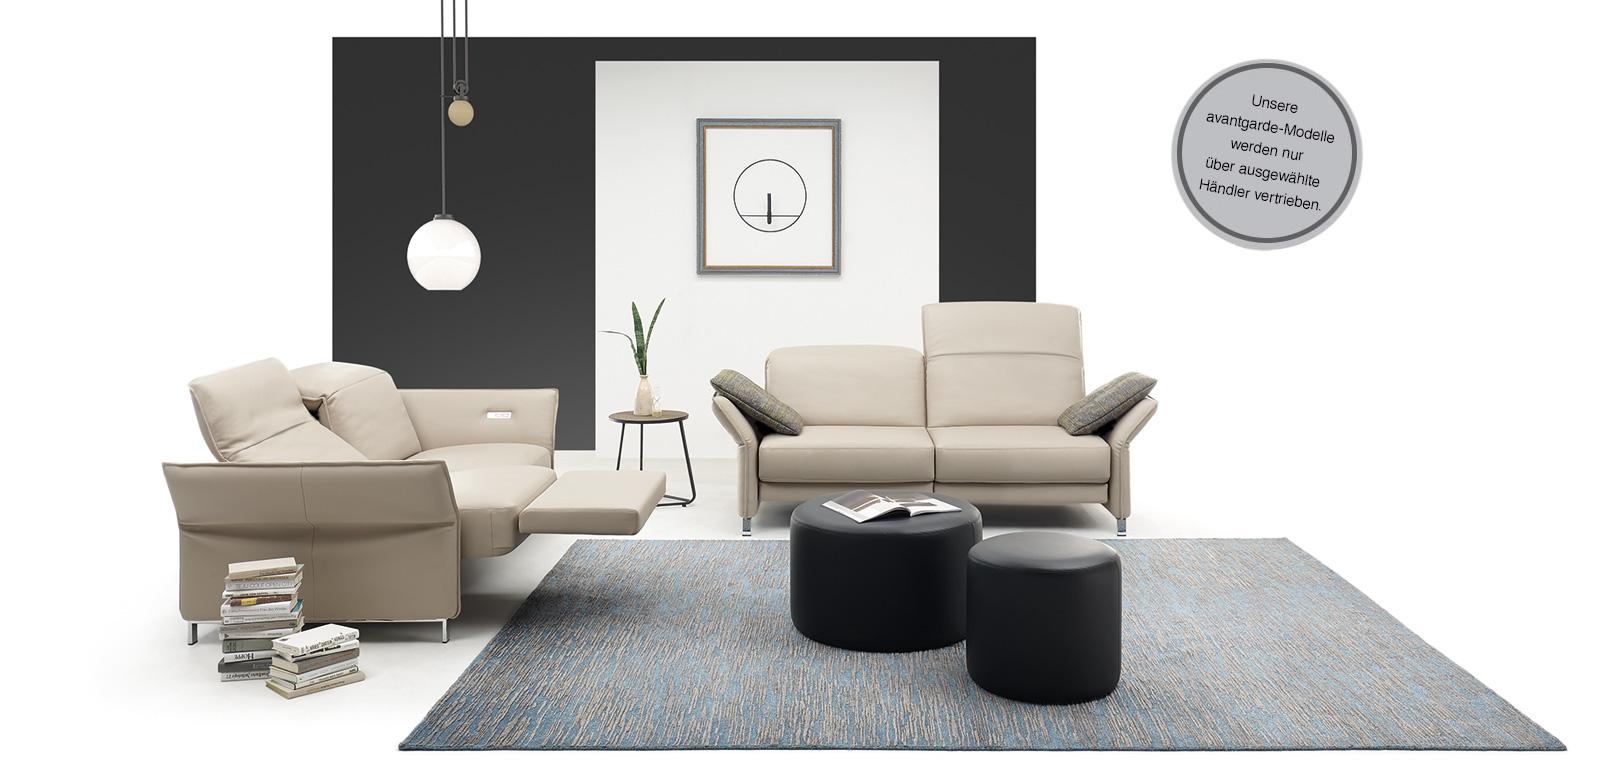 Avantgarde Designmobel Exklusive Sofas